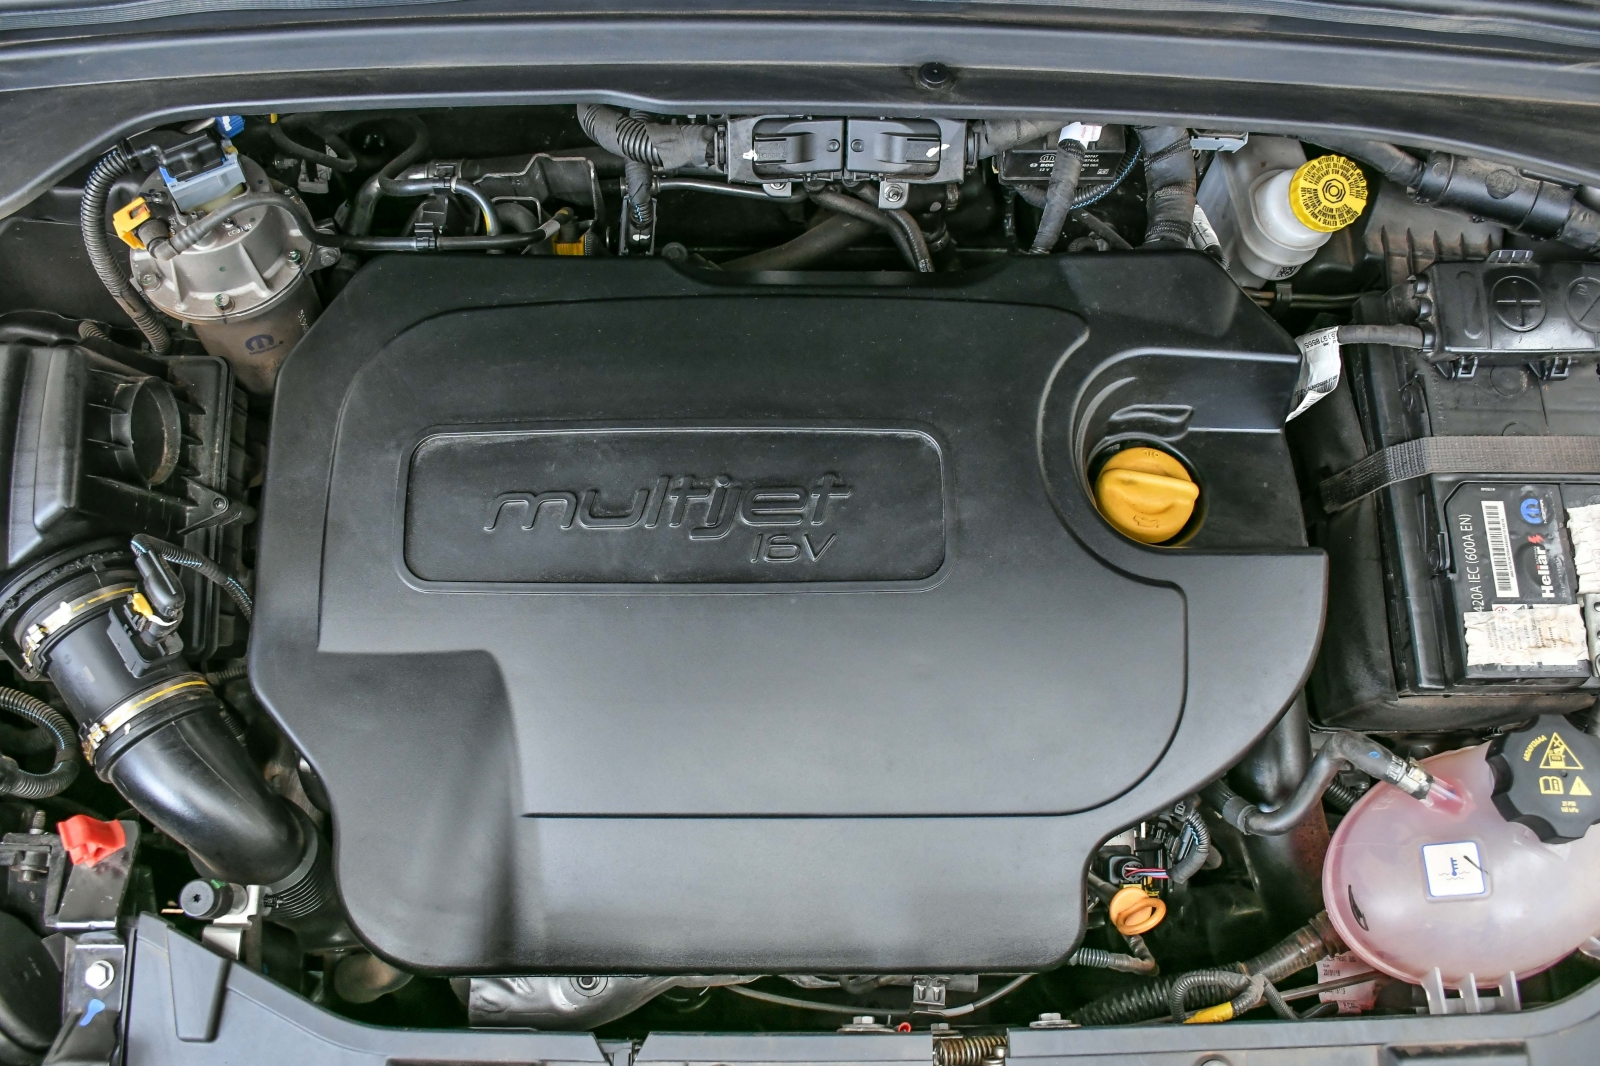 Motor 2.0 turbodiesel dá conta do recado